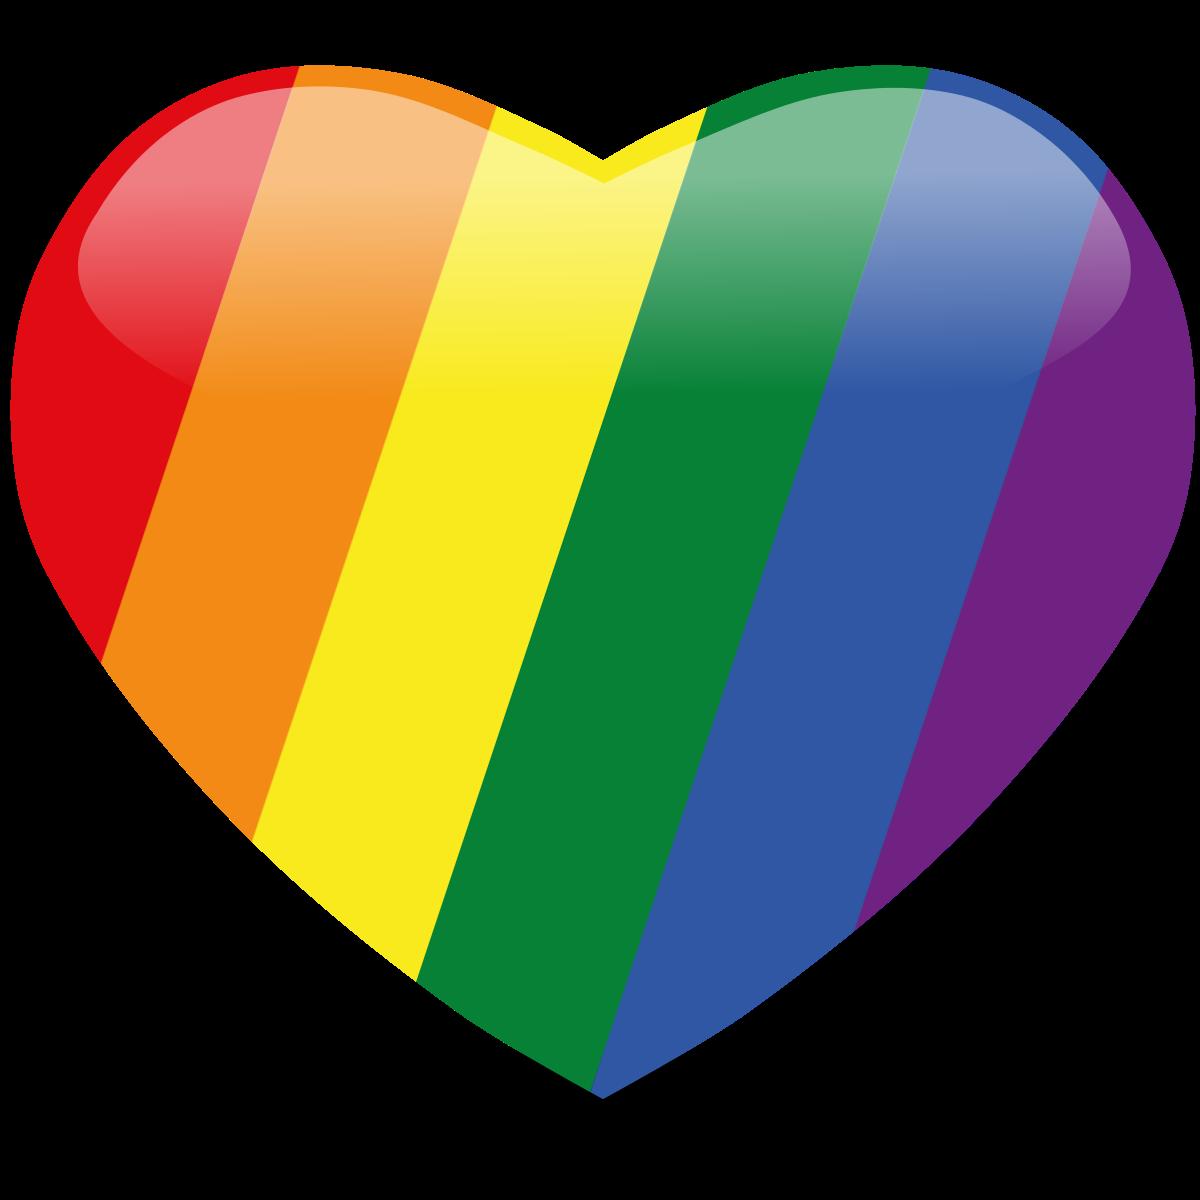 Rainbow hearts png. Heart